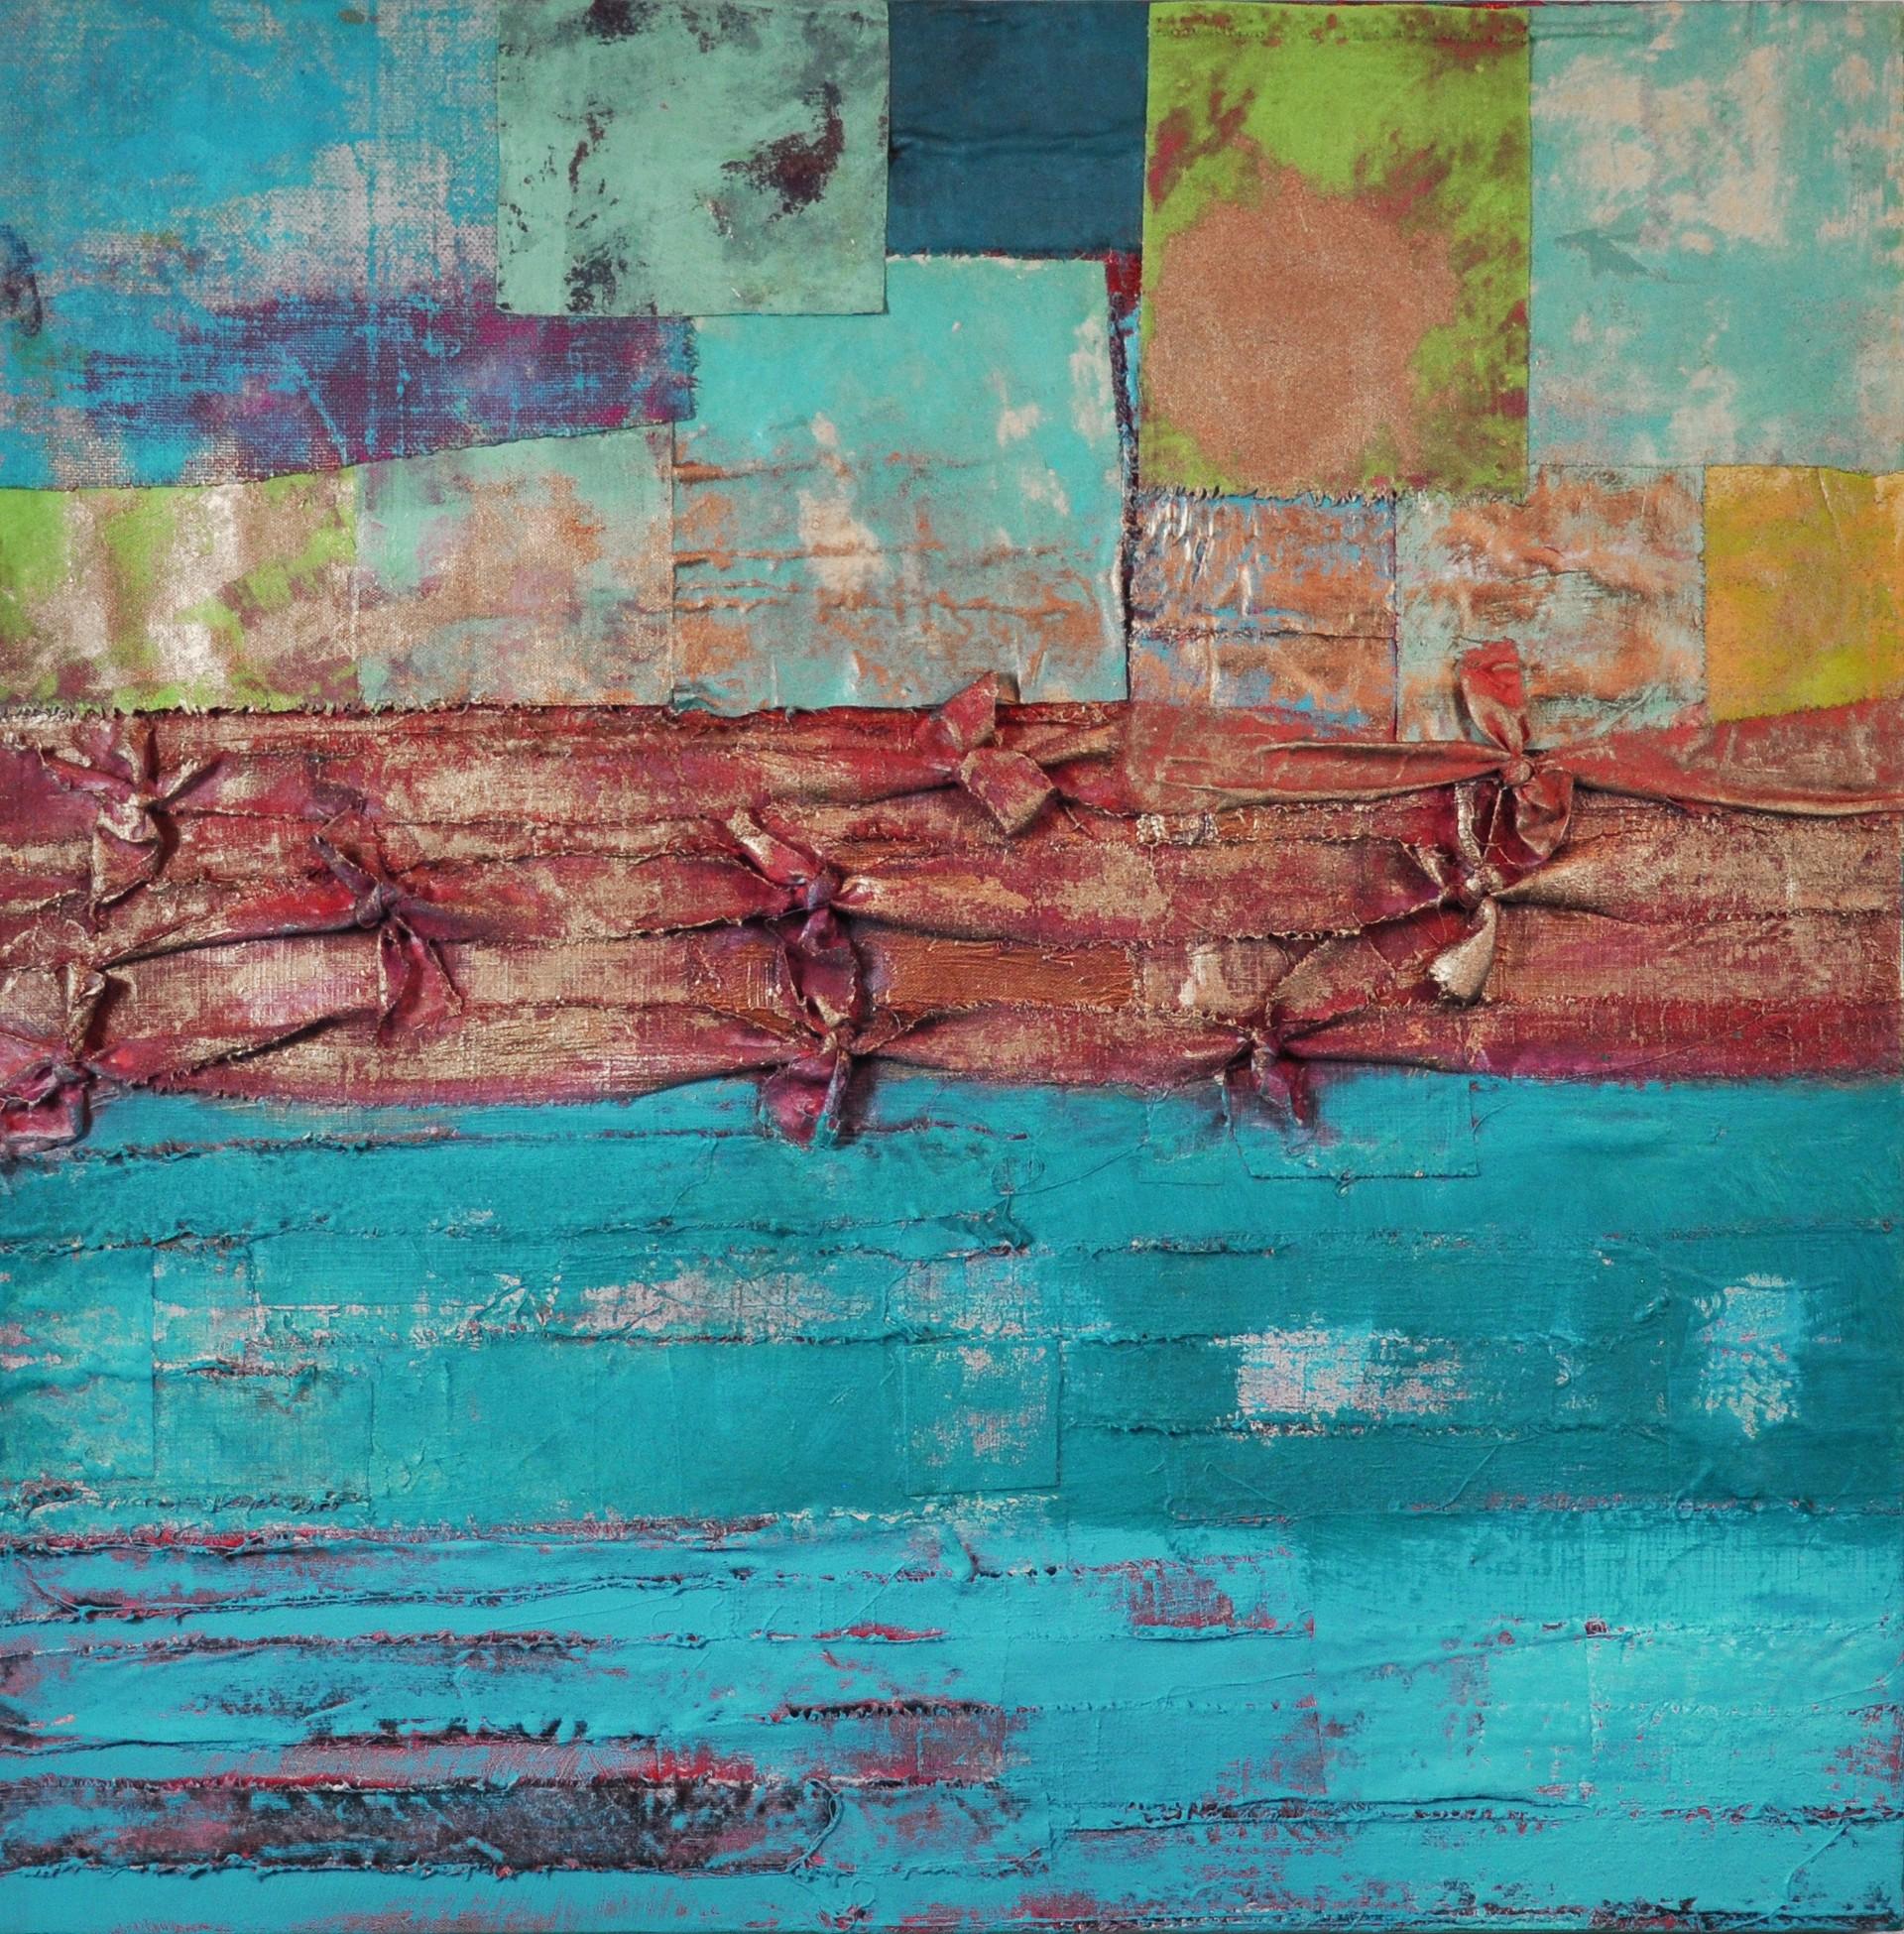 Binding Spell #9 by Kesha Bruce